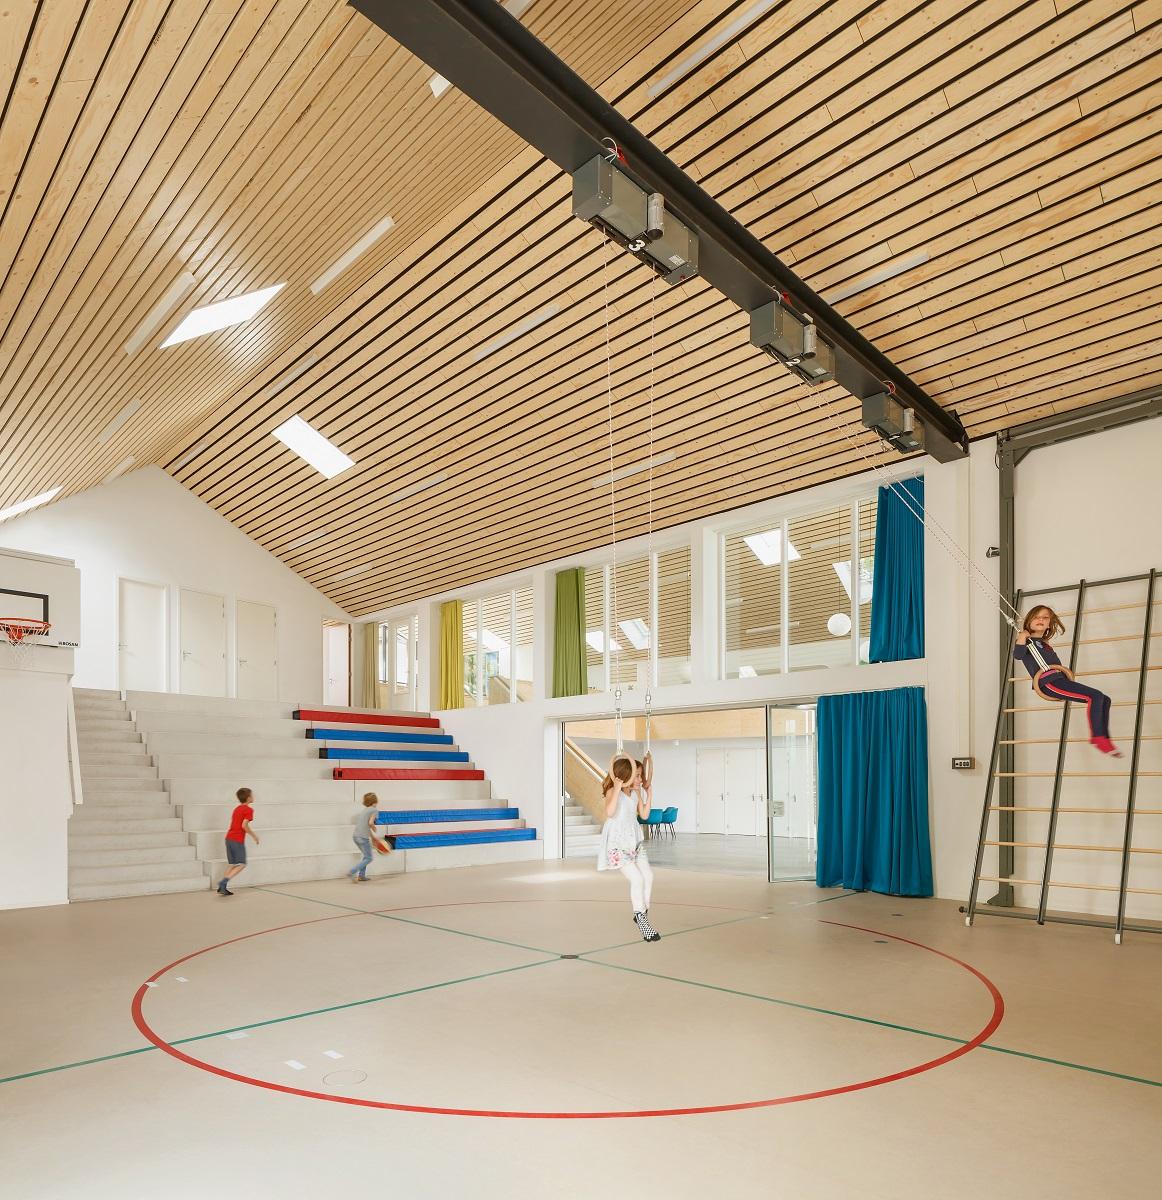 <p>Gymzaal en aulaMFC Biggekerke. Beeld Katja Effting</p>